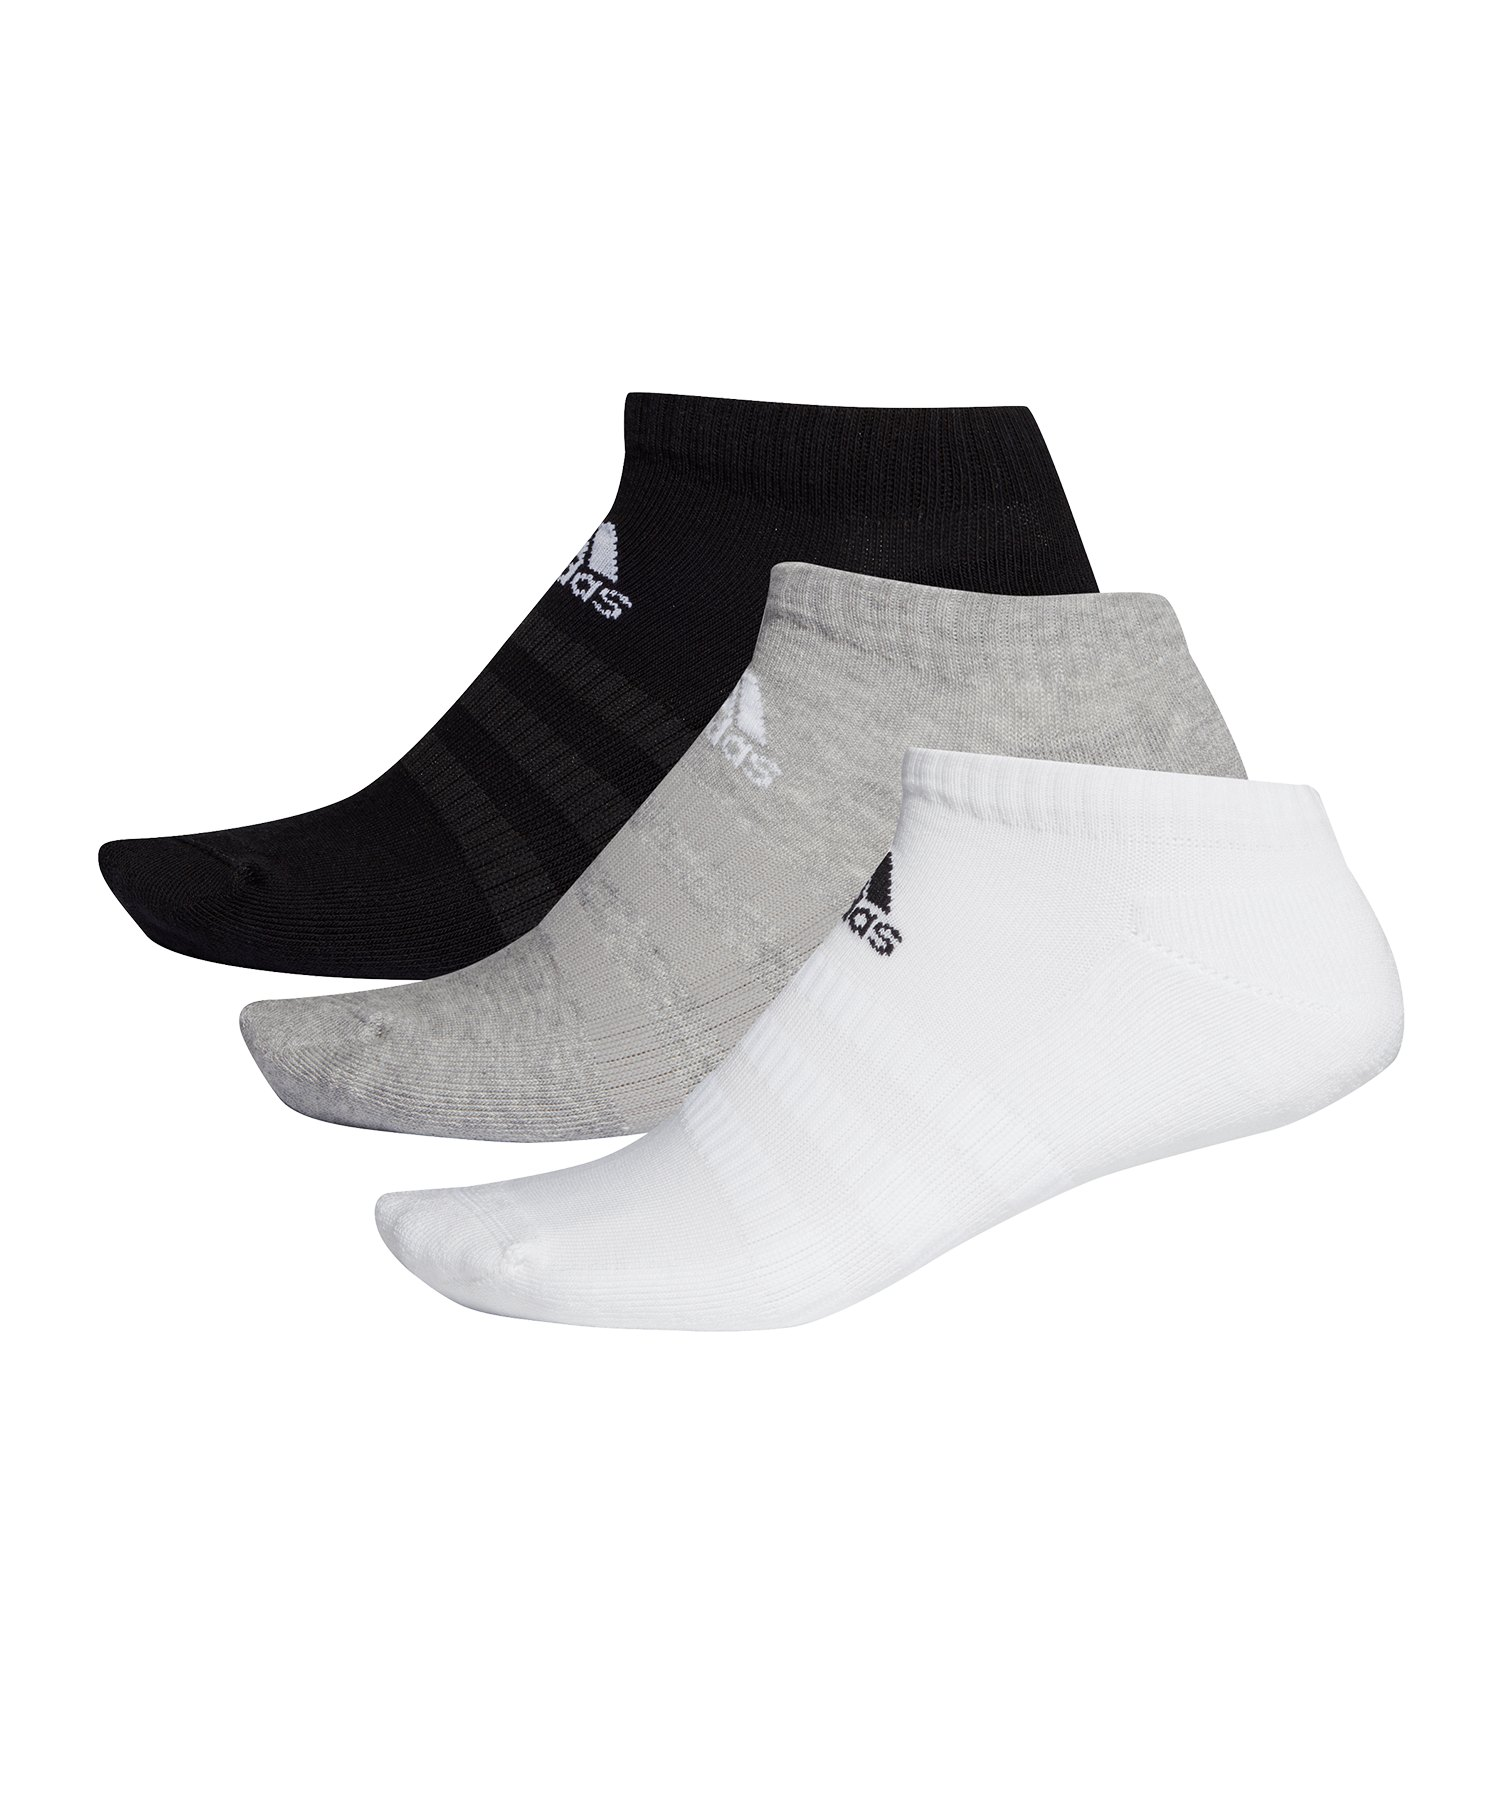 adidas Cush Low 3er Pack Socken Schwarz Weiss Grau - schwarz